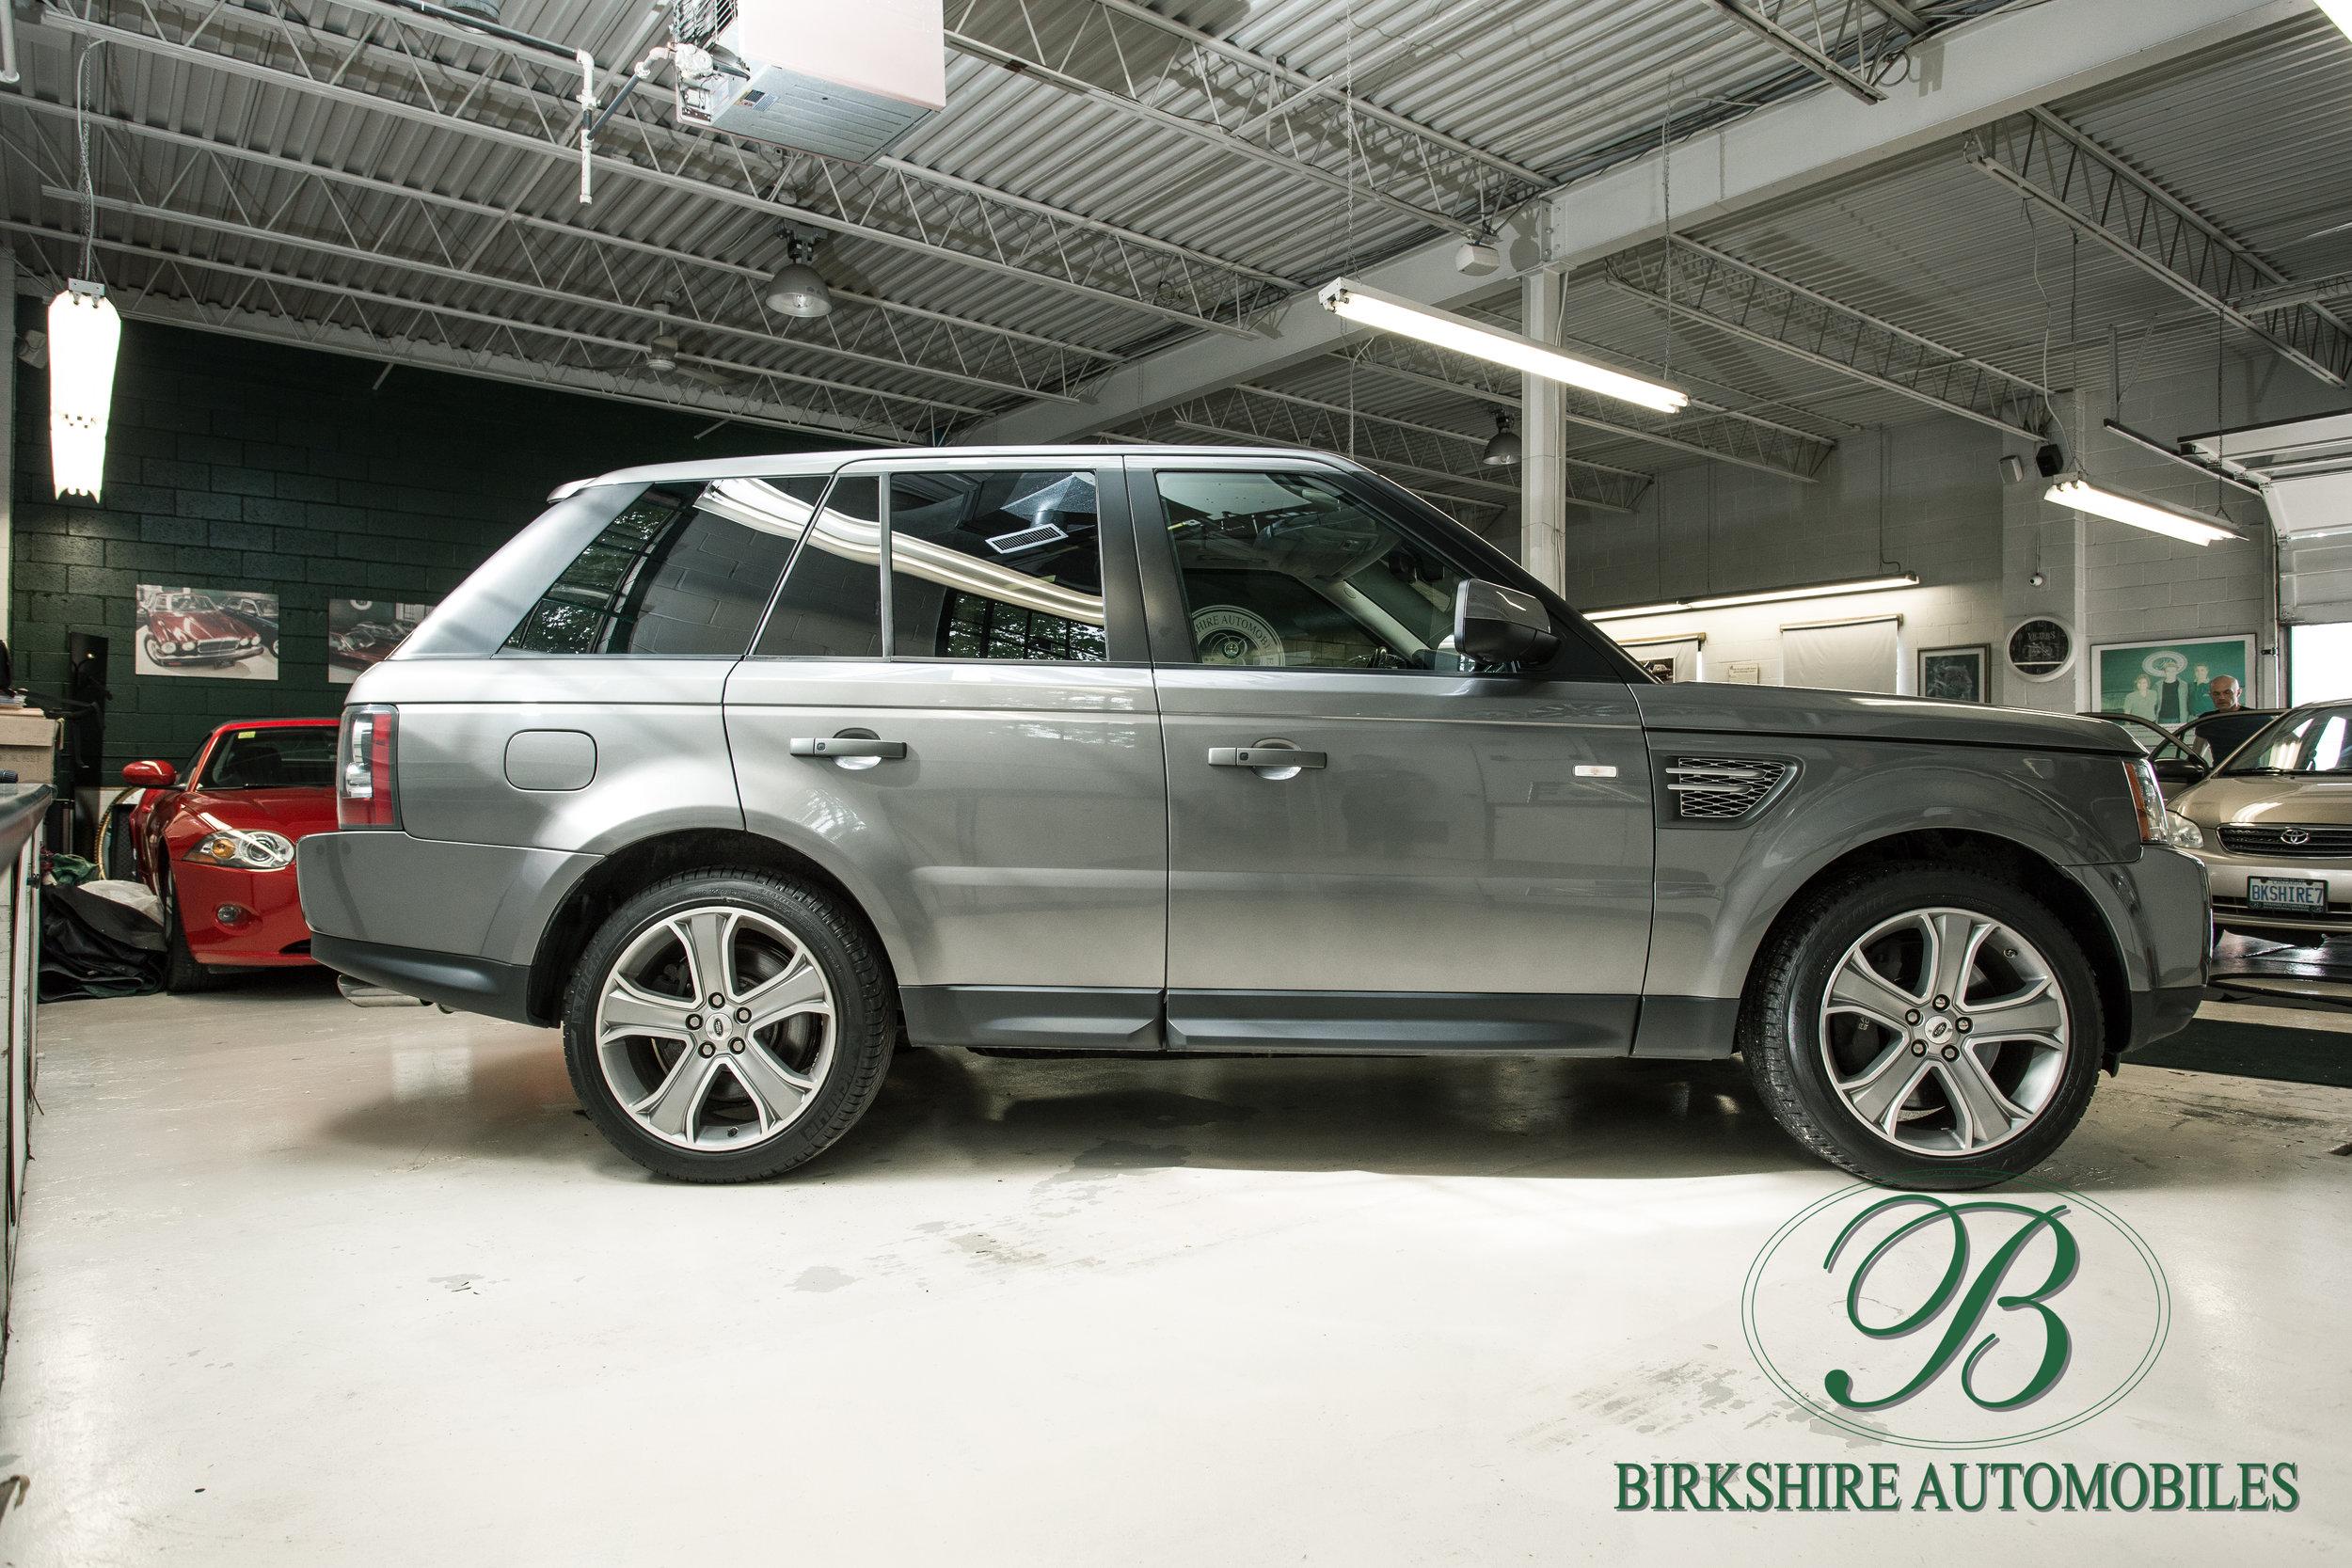 Birkshire Automobiles-12.jpg